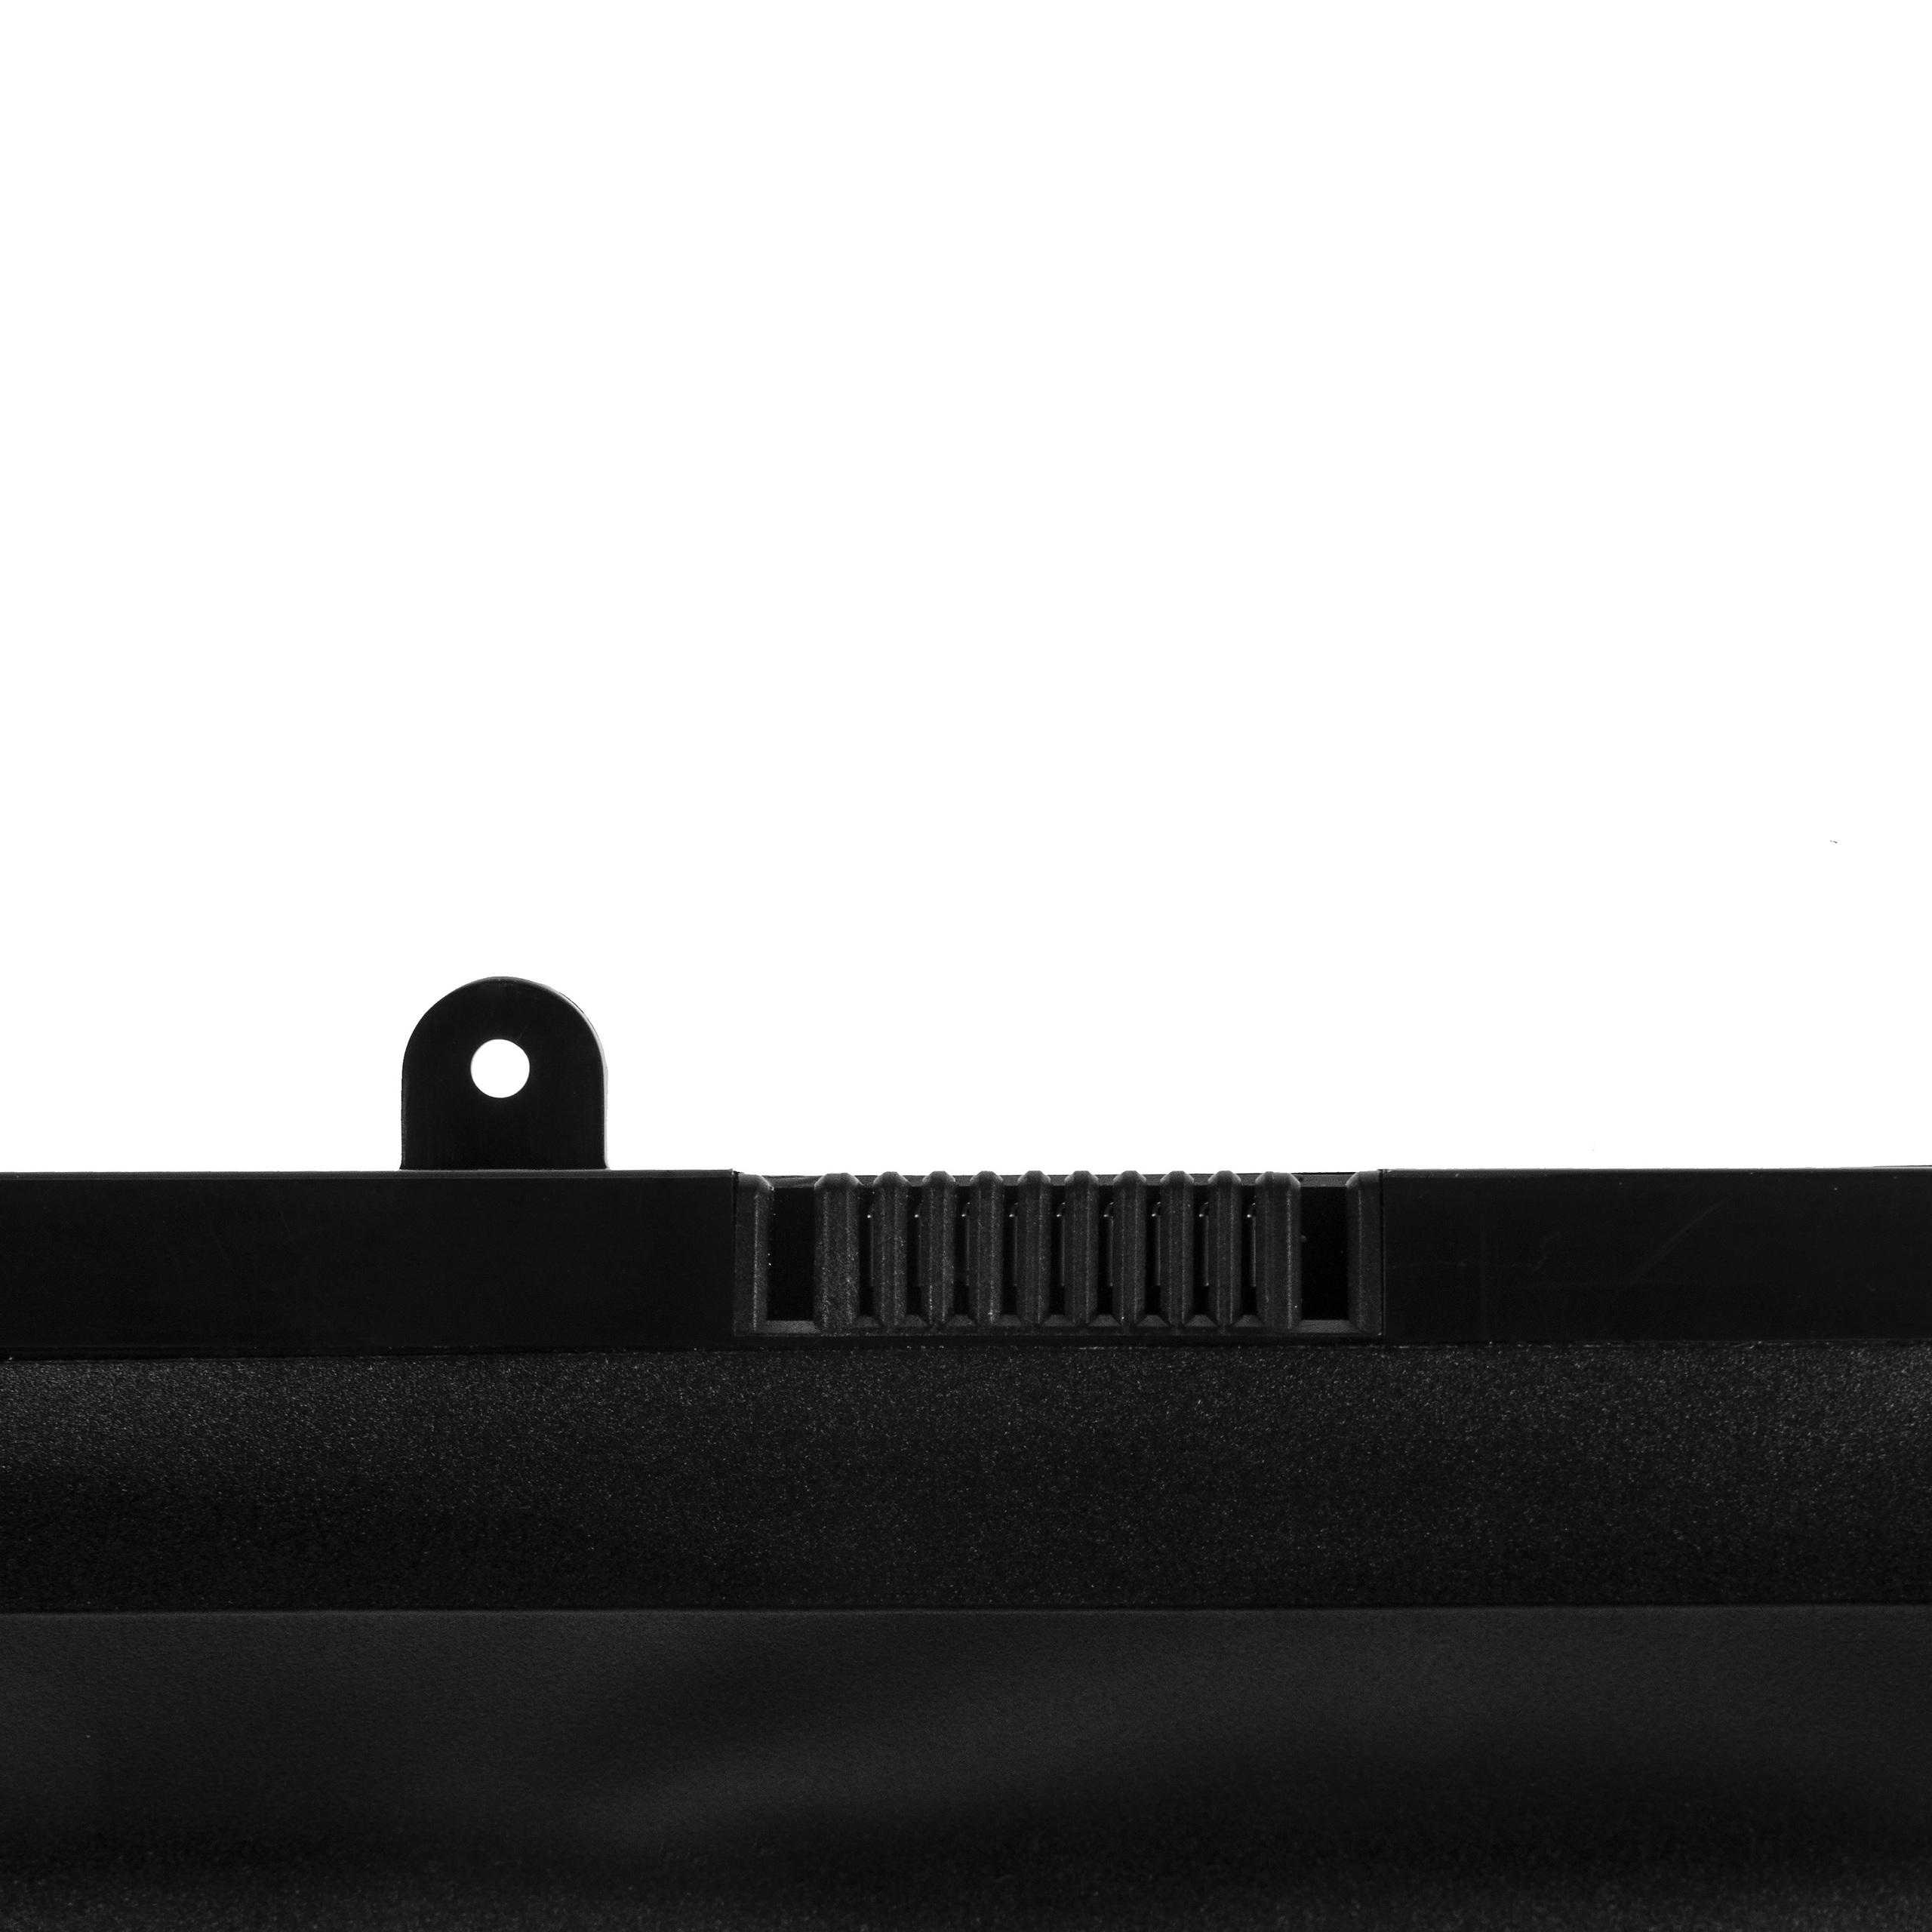 Battery For Asus X200ca Db01t X200ma Ds02 Rclt08 Laptop Baterai X200m F200ca A31n1302 5 Sur 8 2600mah